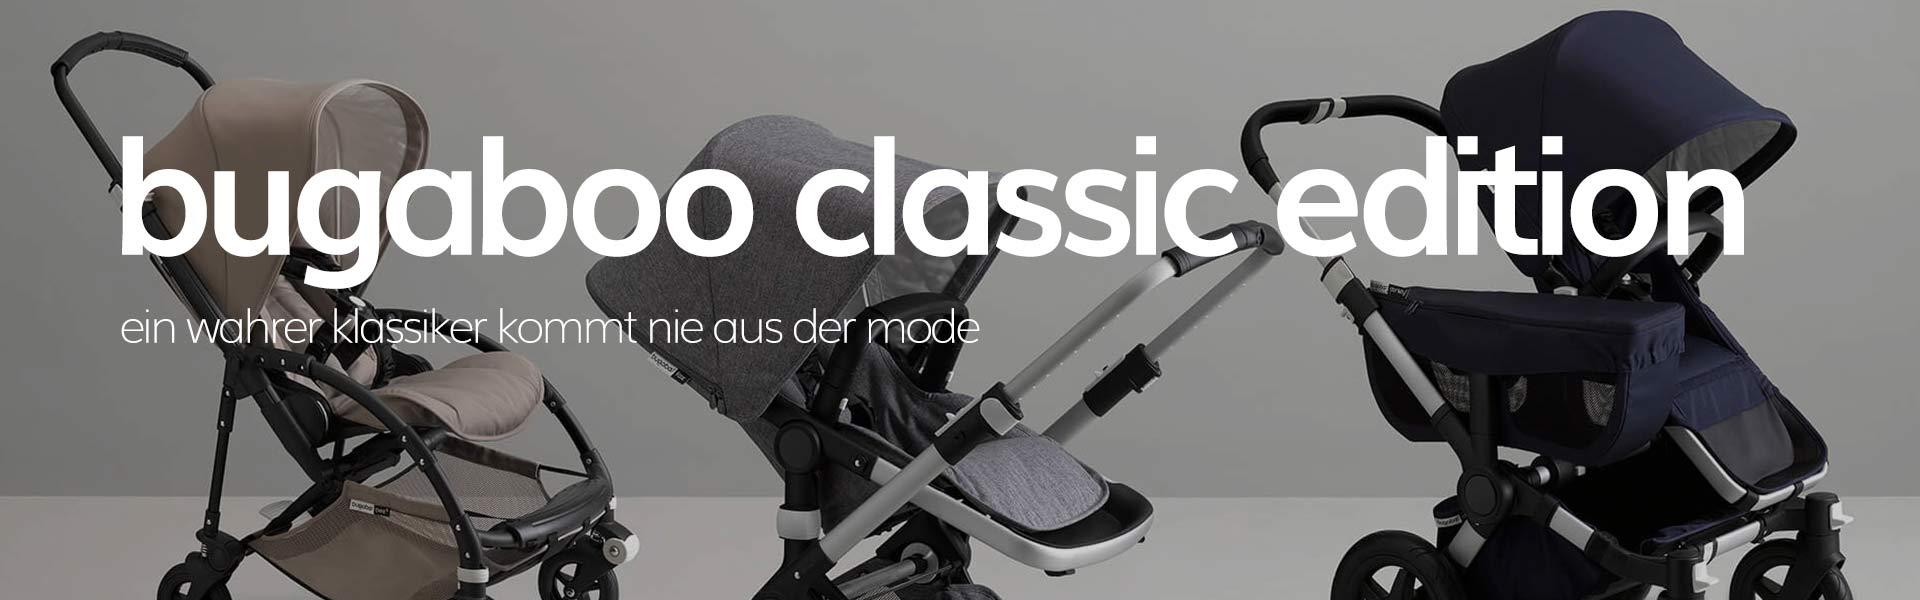 Bugaboo-Classic-Edition-Donkey - ARTIKEL